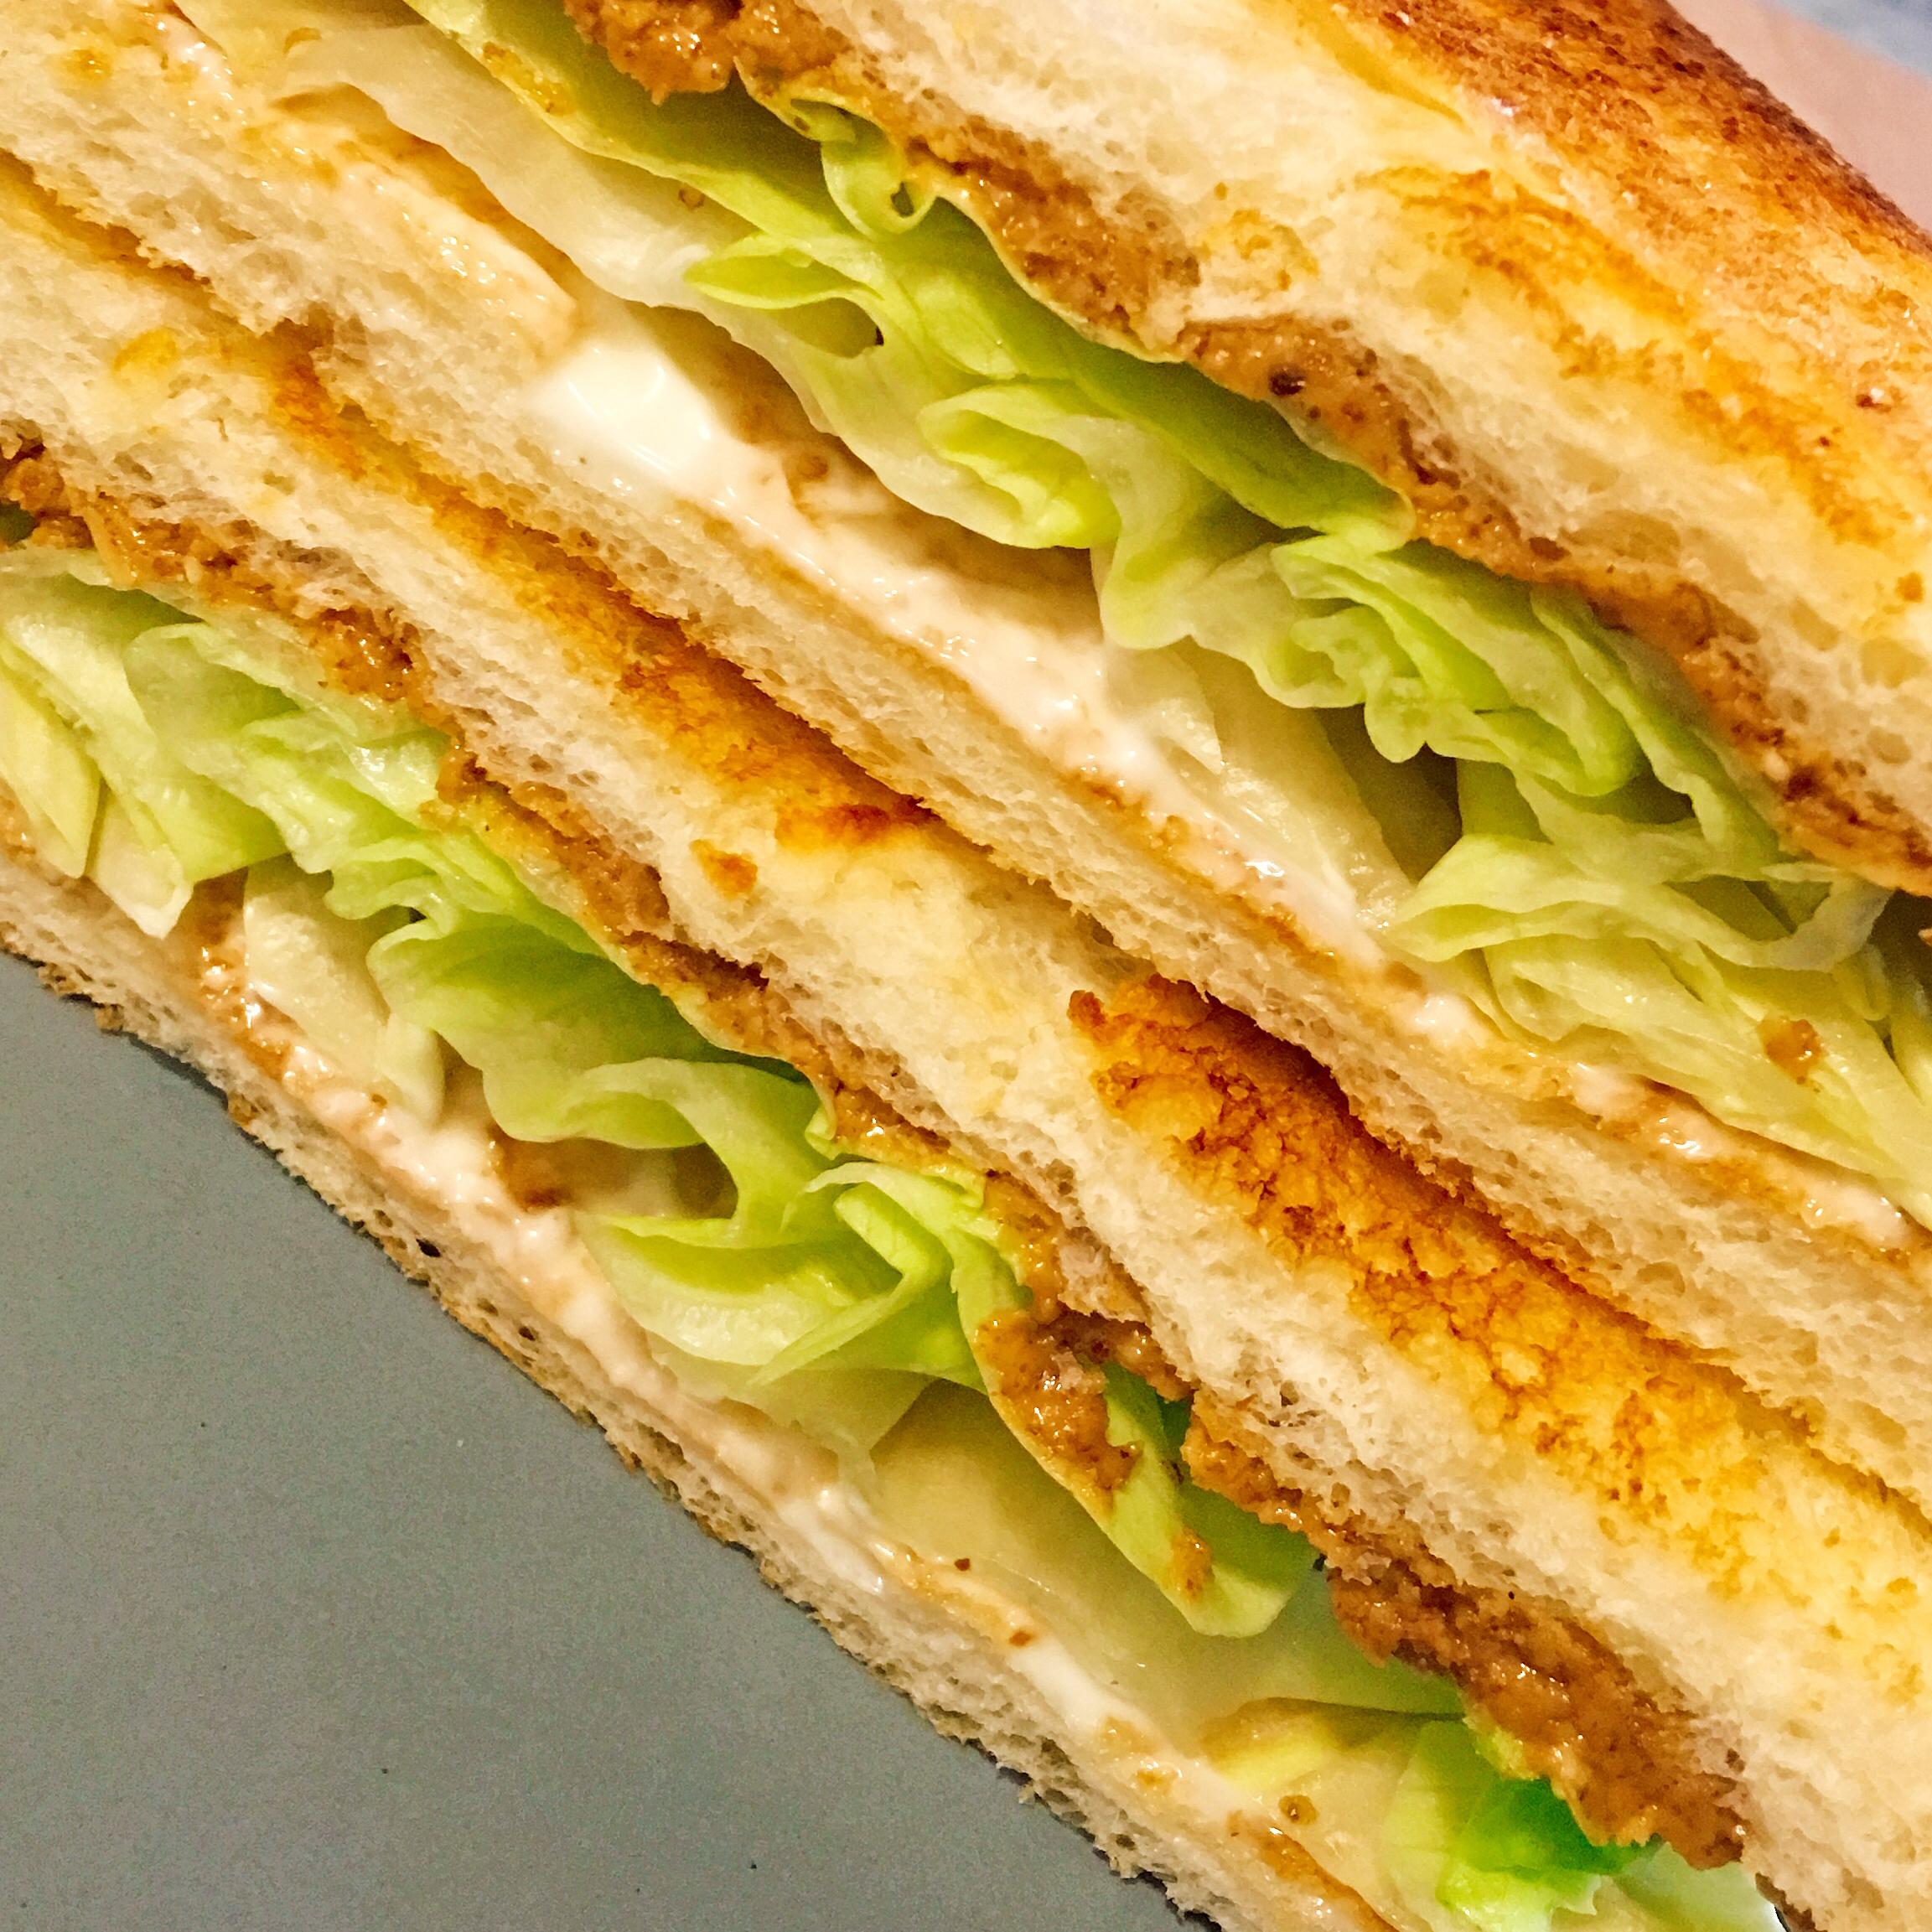 Peanut Butter, Mayonnaise, and Lettuce Sandwich Vanessa Martens